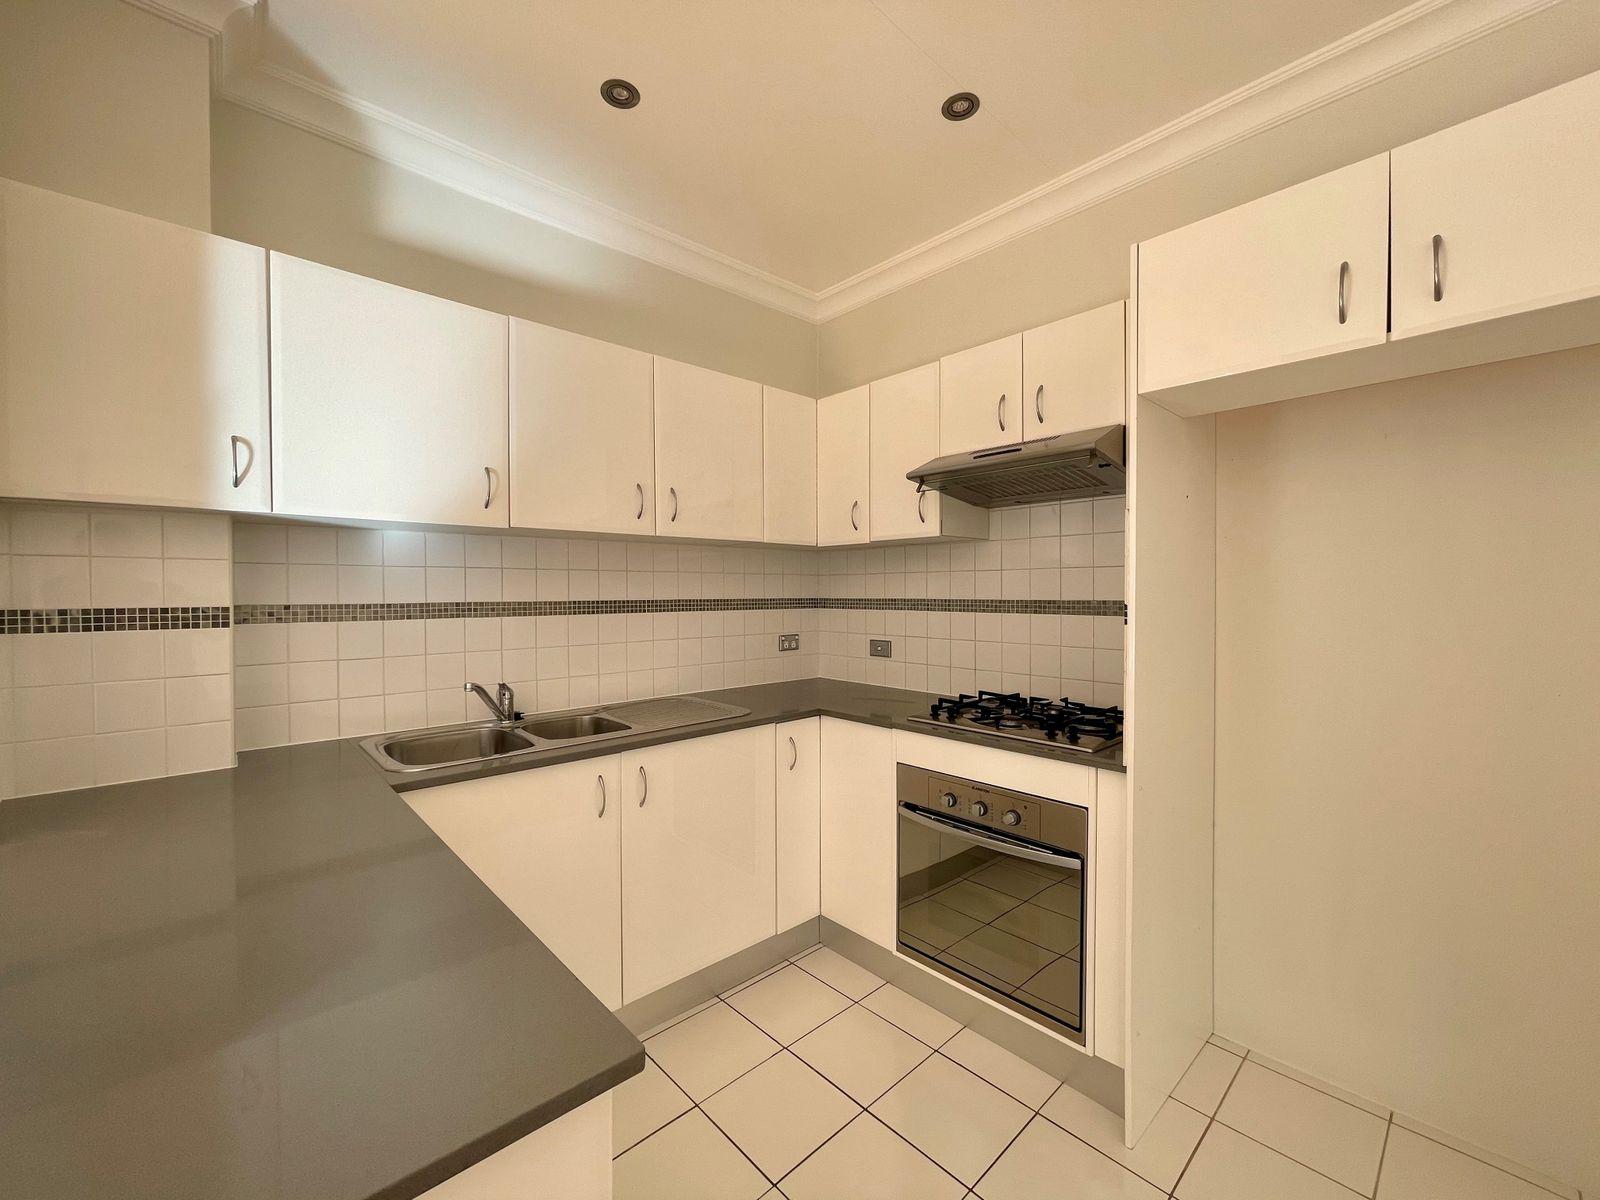 2/568-572 King Street, Newtown, NSW 2042